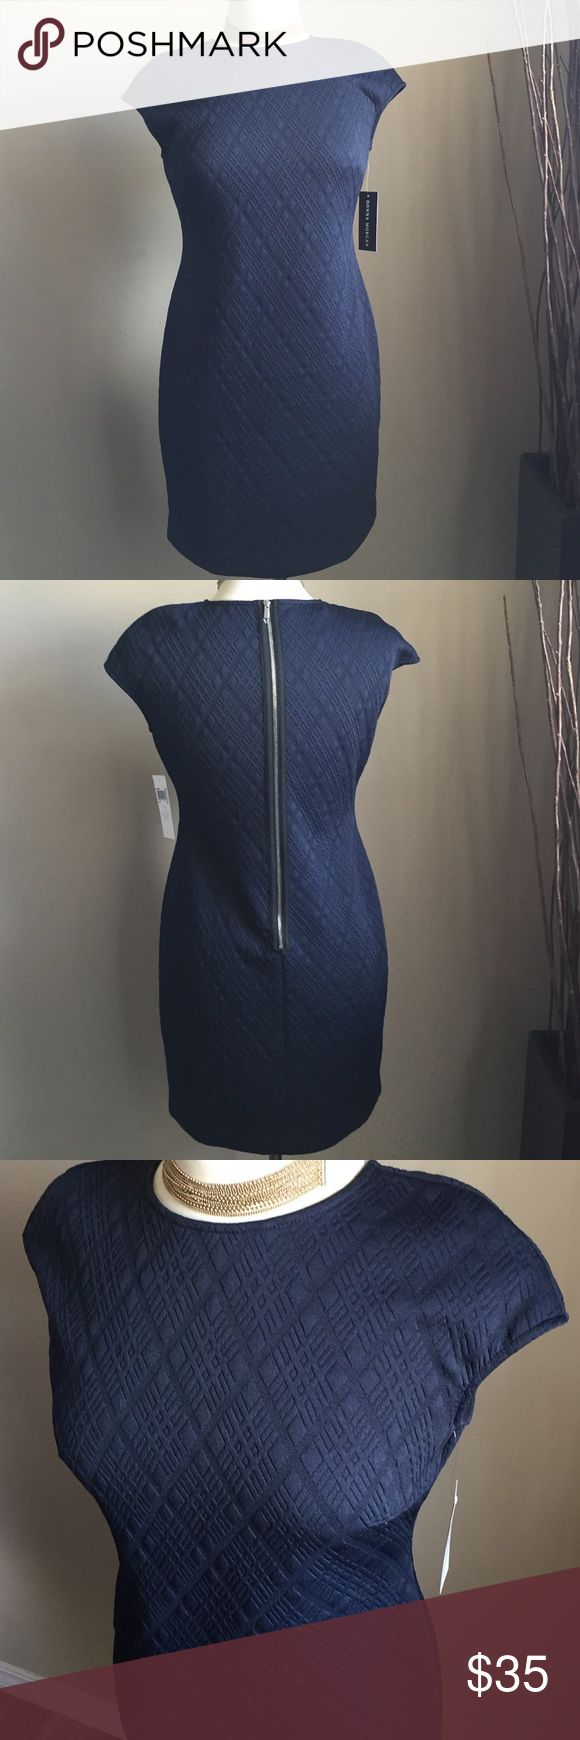 Donna Morgan Dress Donna Morgan textured sheath dress, navy blue, new missing tags Donna Morgan Dresses Mini